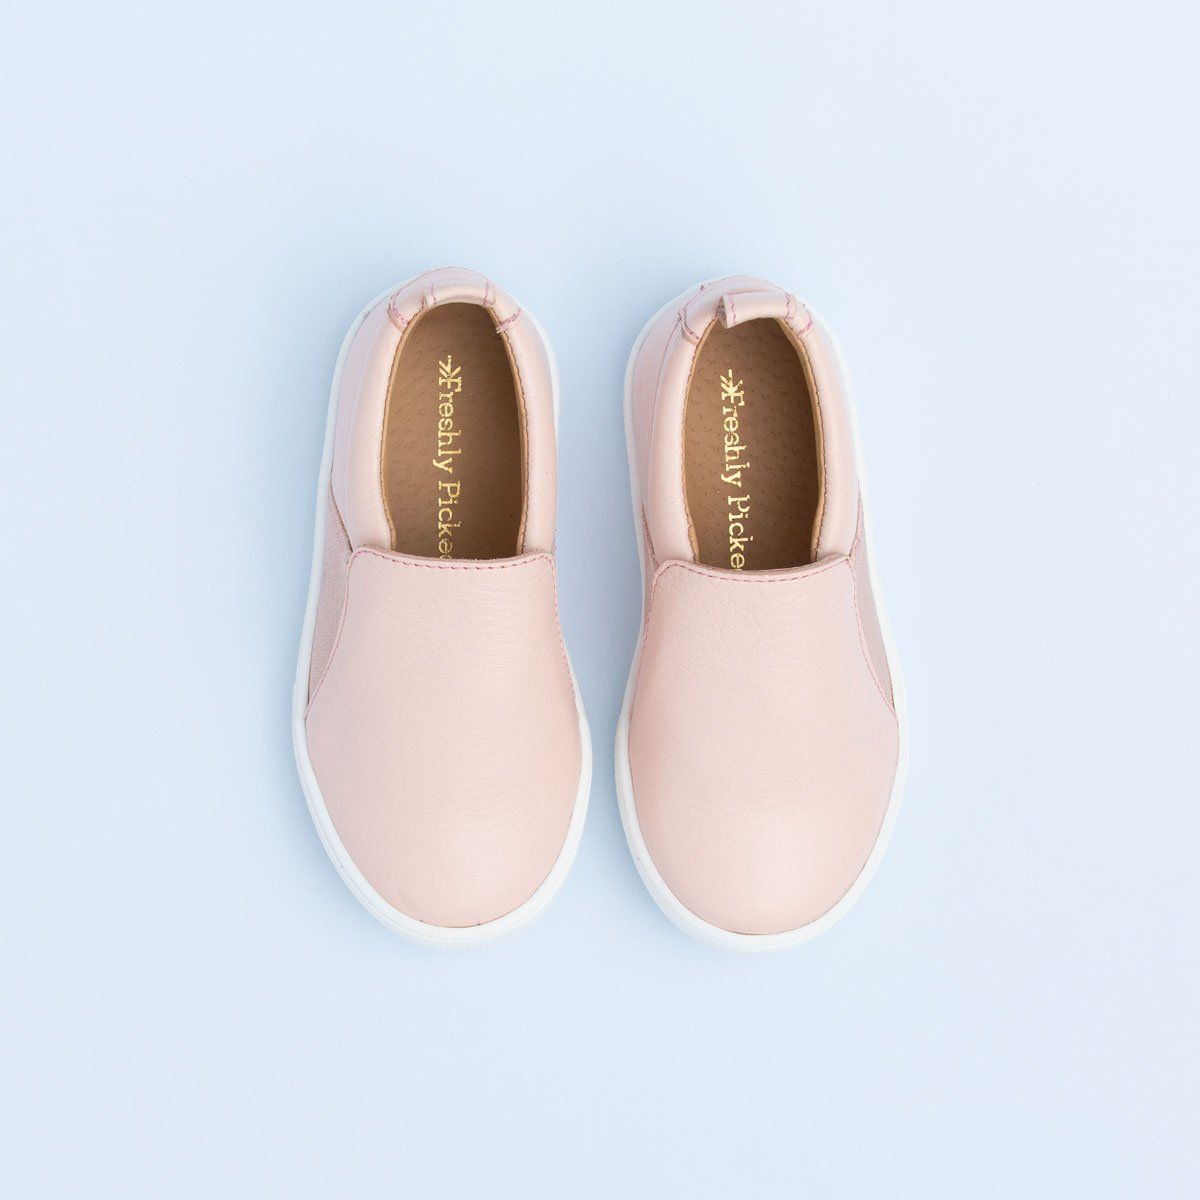 718e4284b Blush Slip on sneaker - Freshly Picked | Products | Sneakers, Slip ...